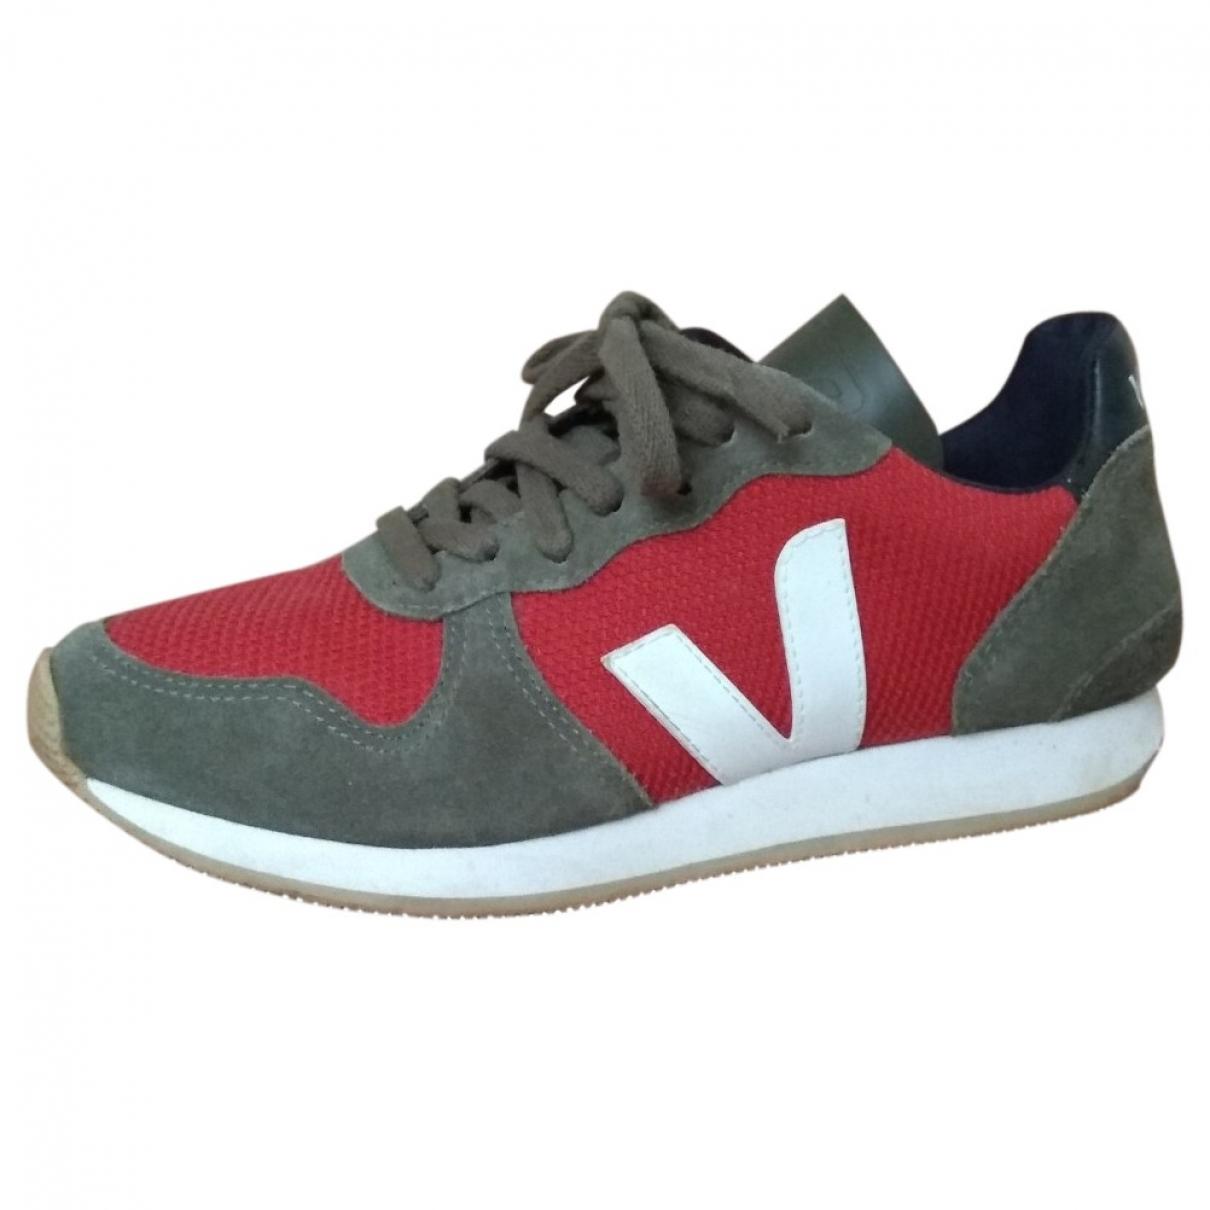 Veja \N Sneakers in  Gruen Leinen